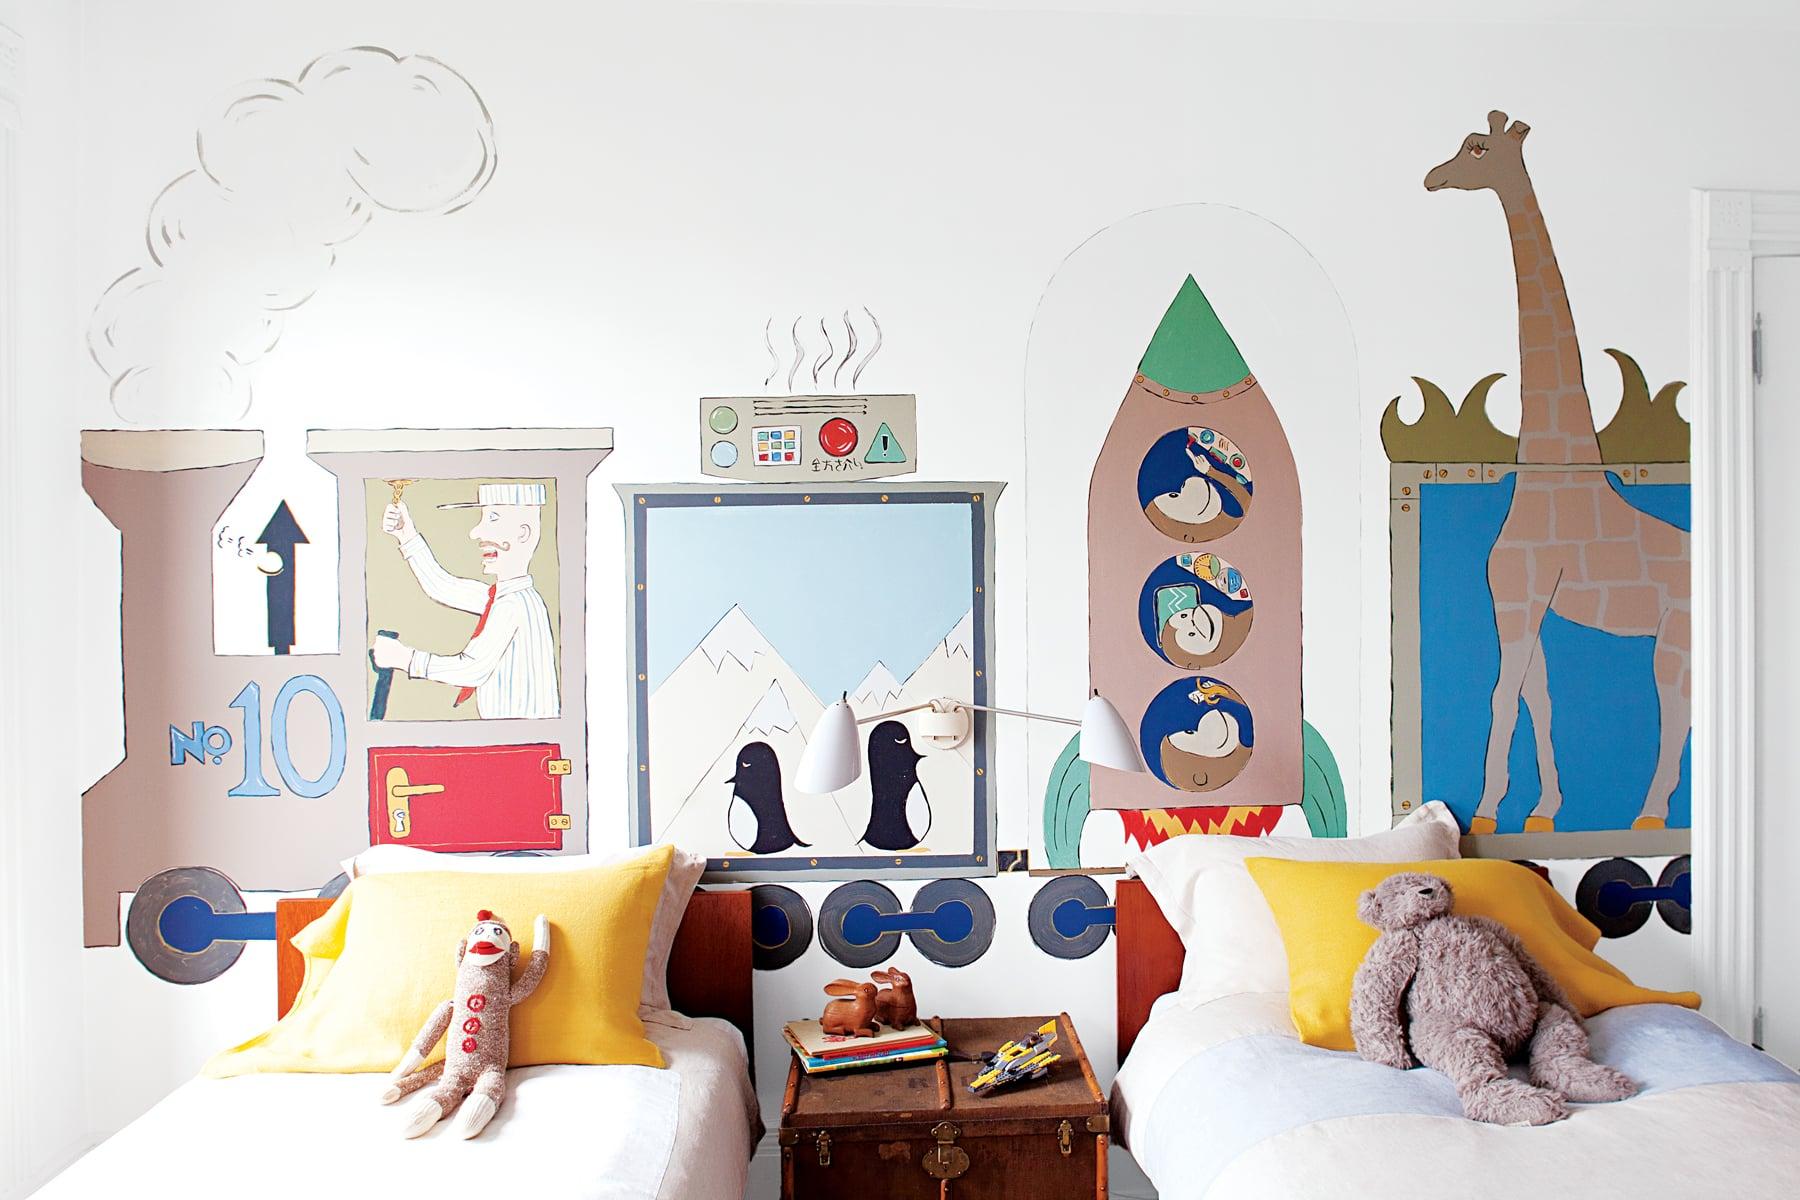 Kids Room Decorating Tips From Martha Stewart Living | POPSUGAR Moms